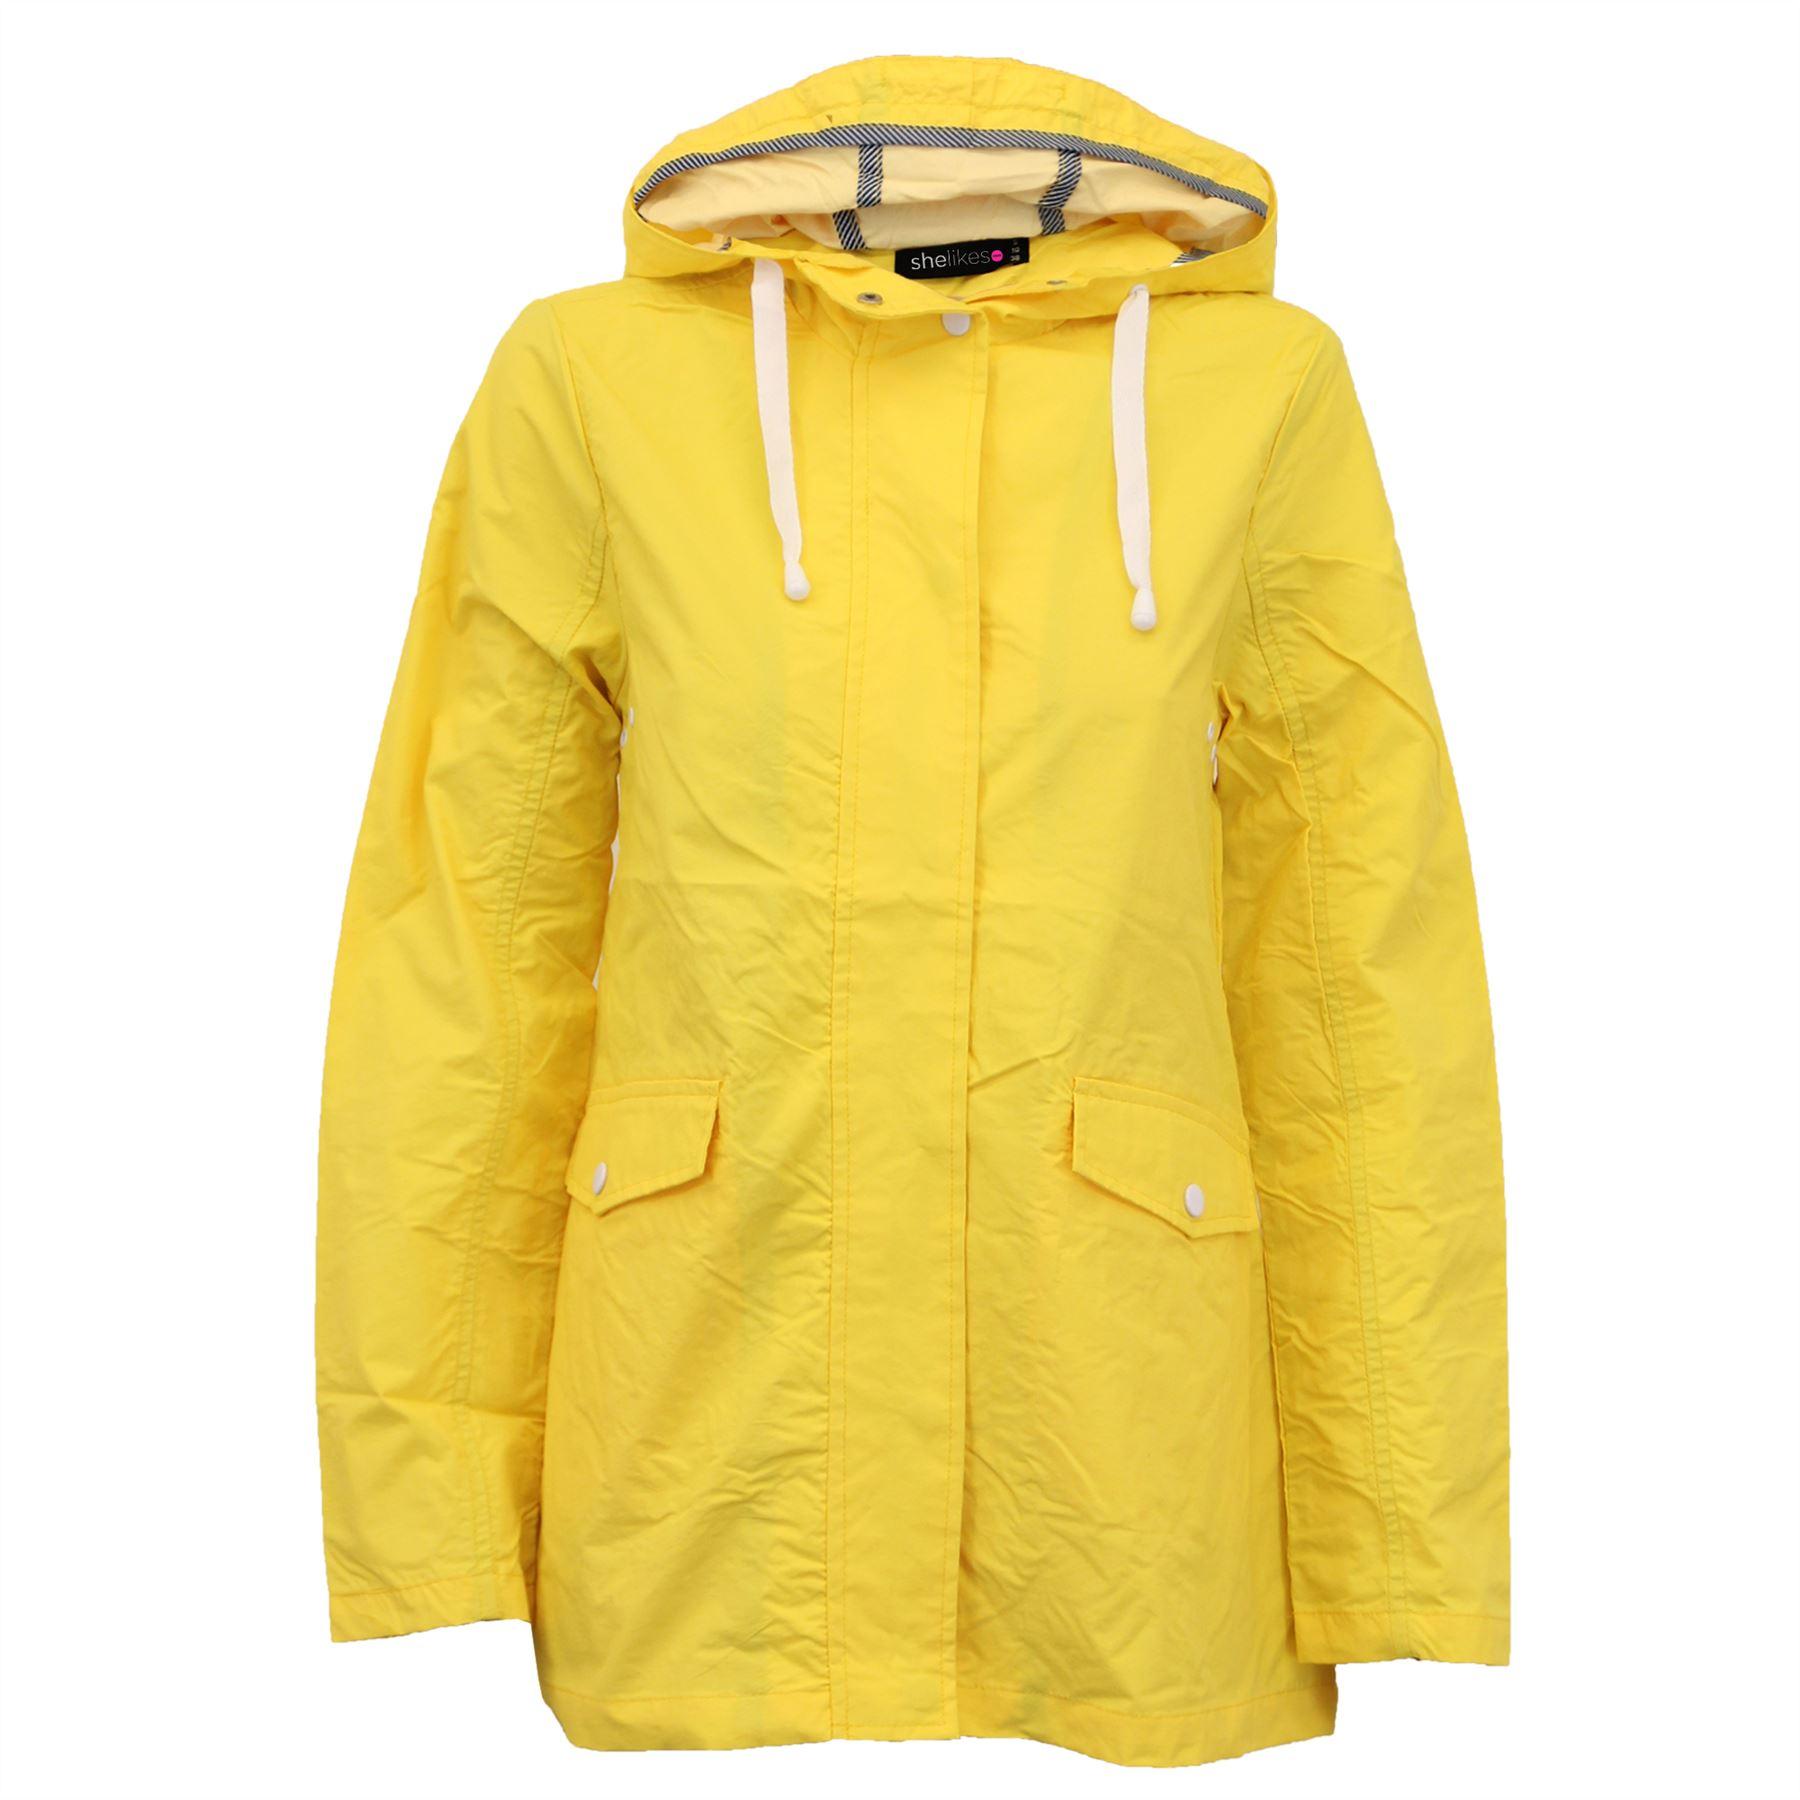 New-Womens-Lightweight-Rain-Trench-Coat-Jacket-Parka-Daily-Rain-Mac thumbnail 16